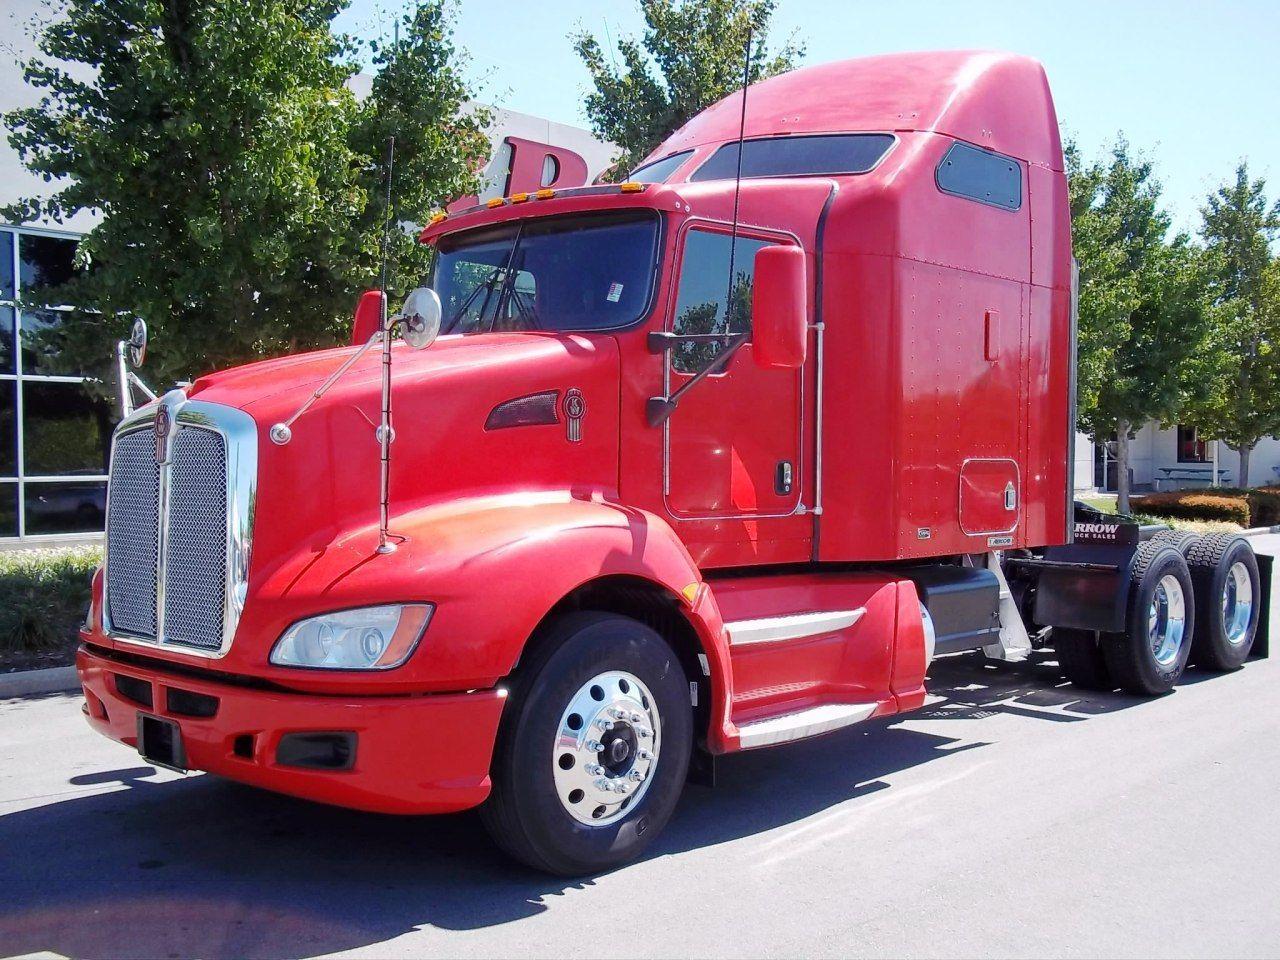 kenworth pickup truck images - HD1280×960